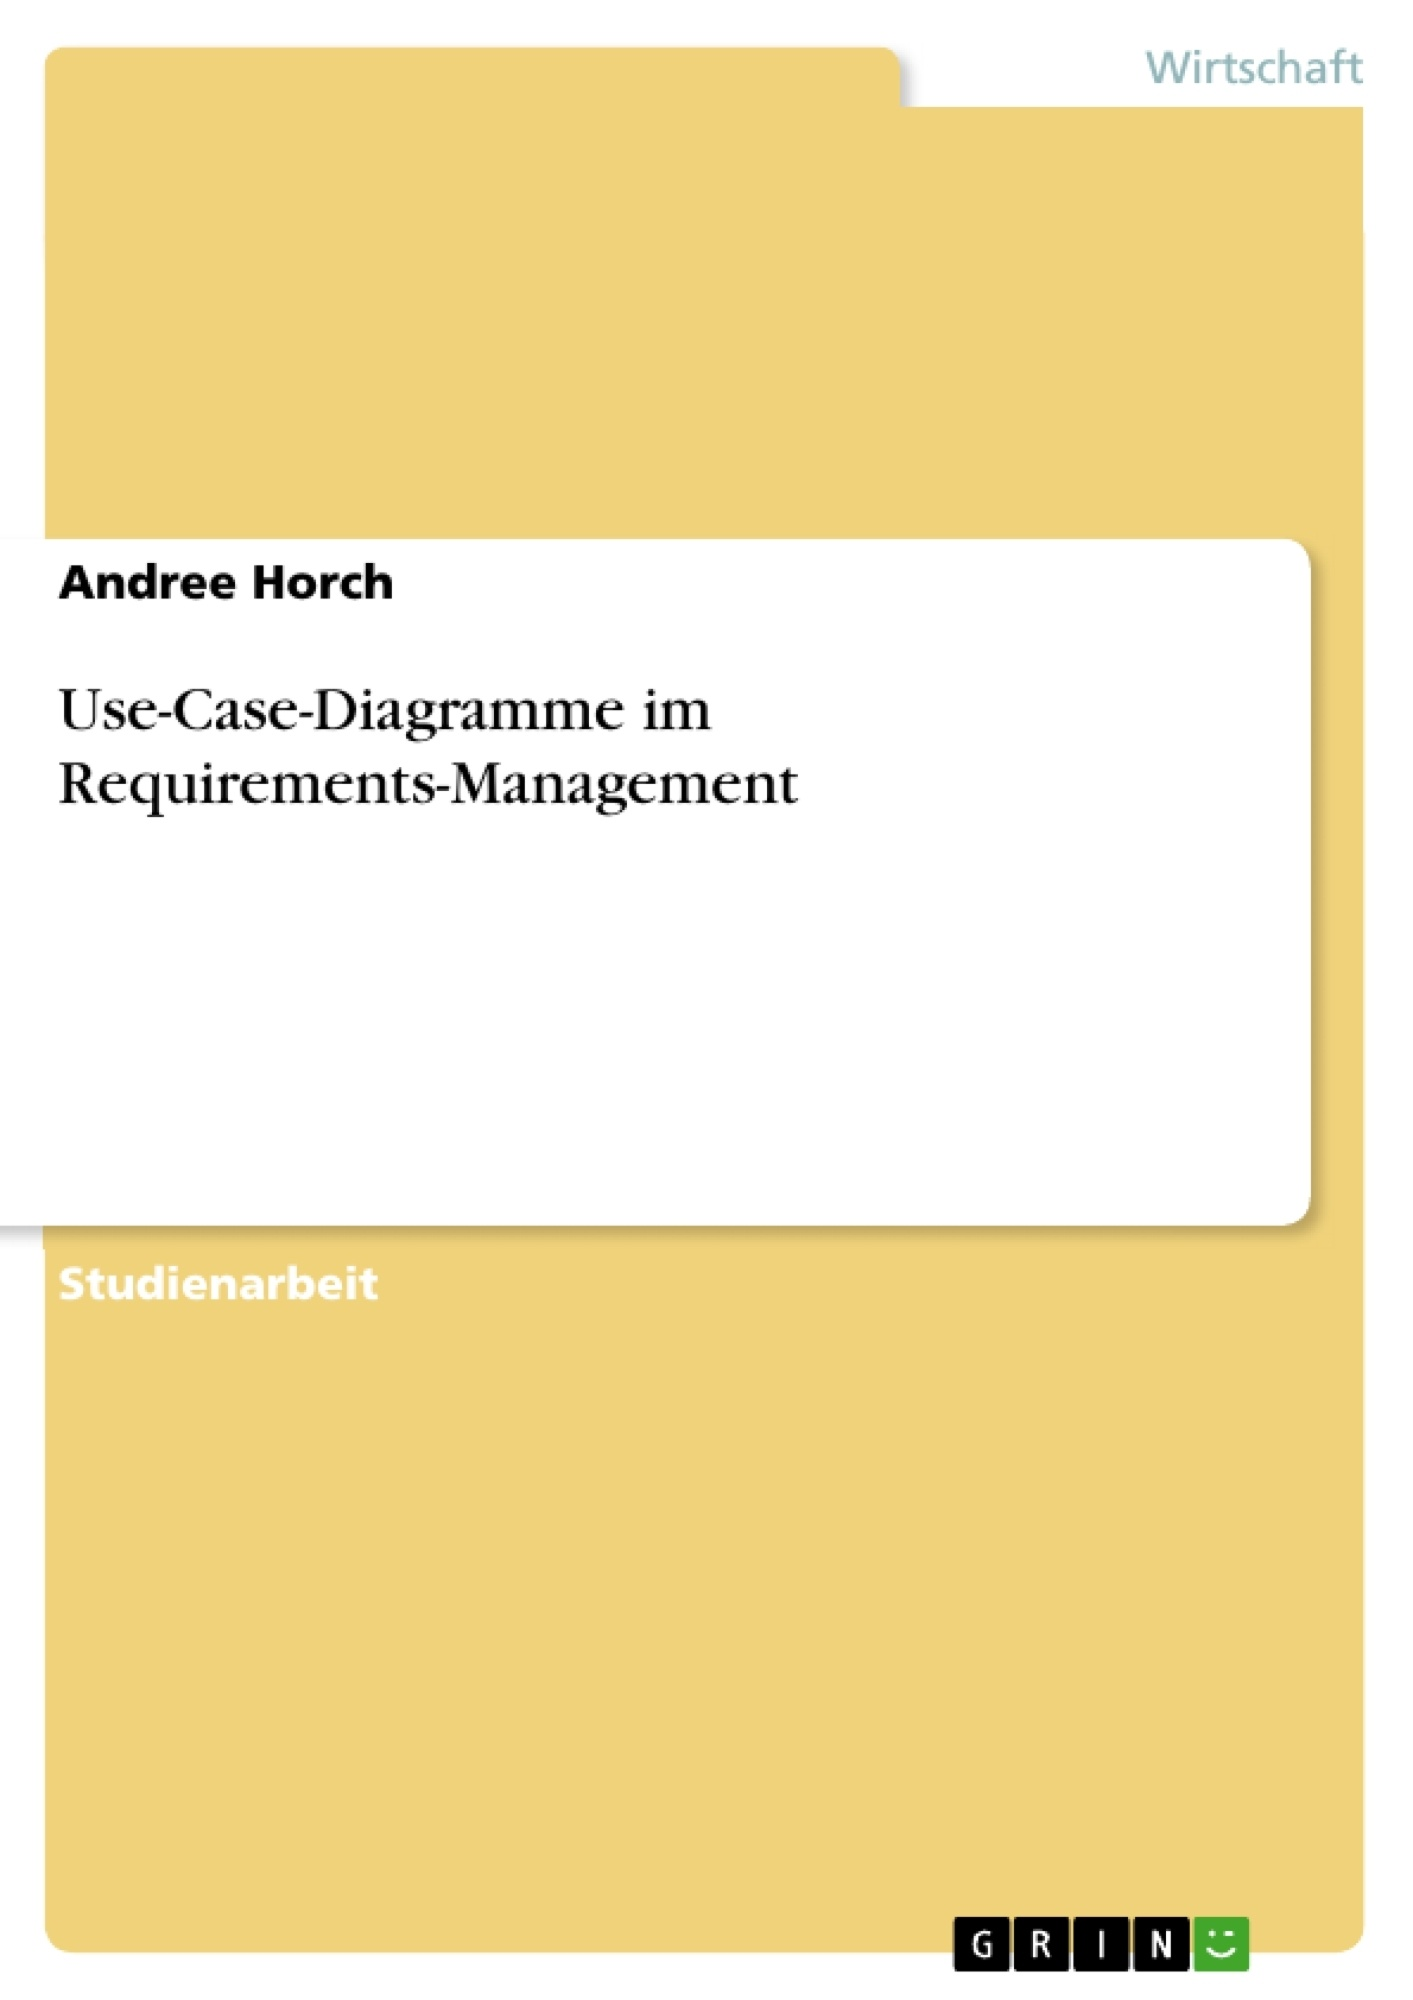 Titel: Use-Case-Diagramme im Requirements-Management